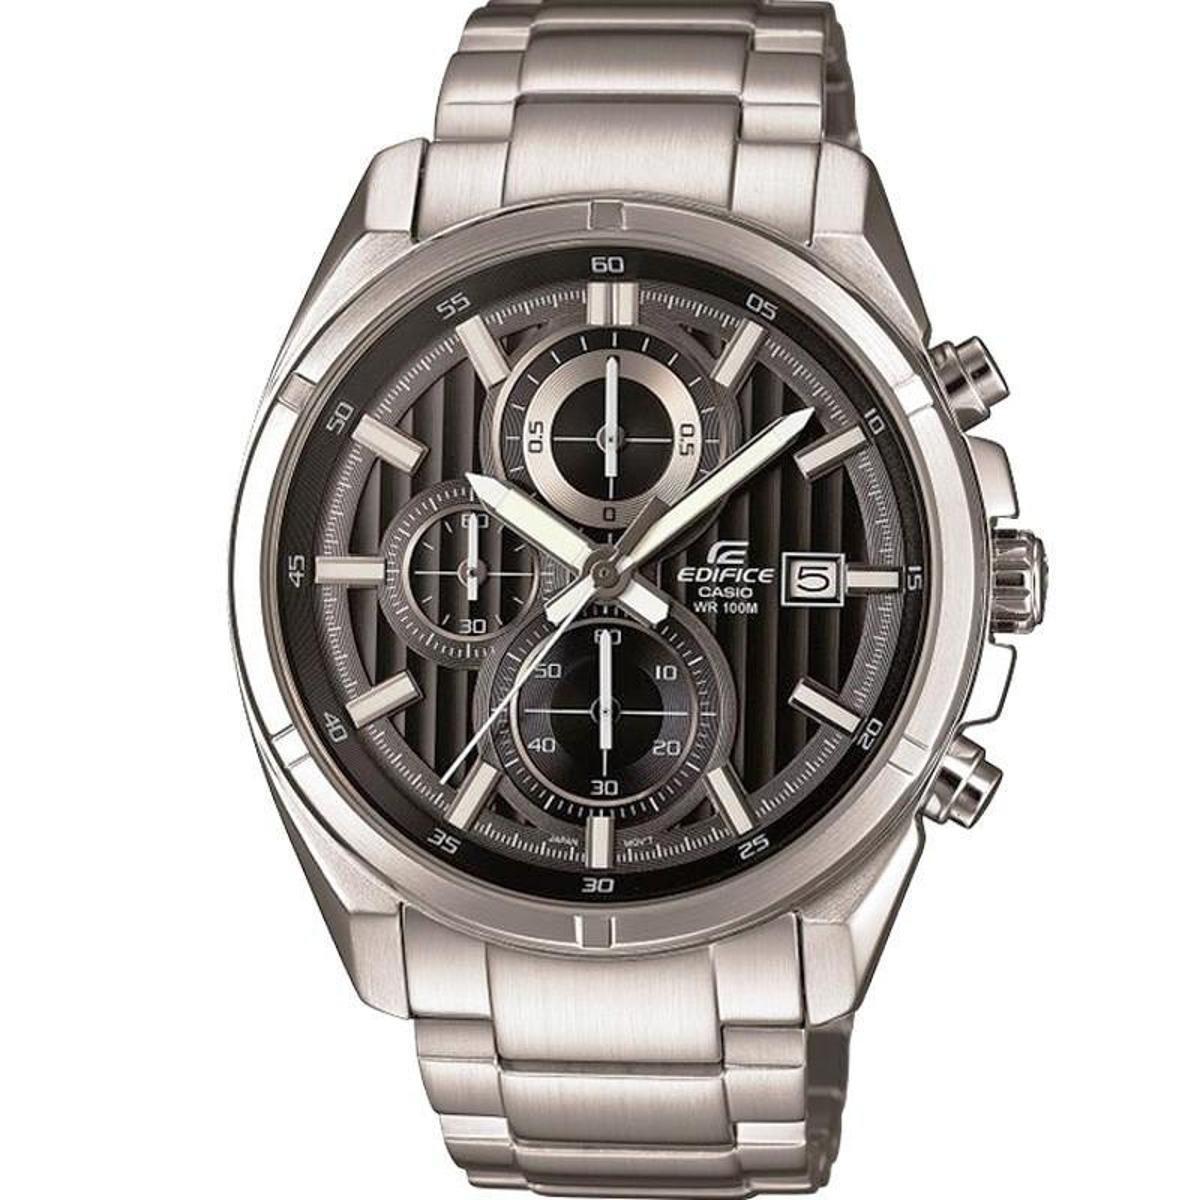 0dc340659af Relógio Casio Edifice EFR-532ZD-1AV 42mm - Compre Agora